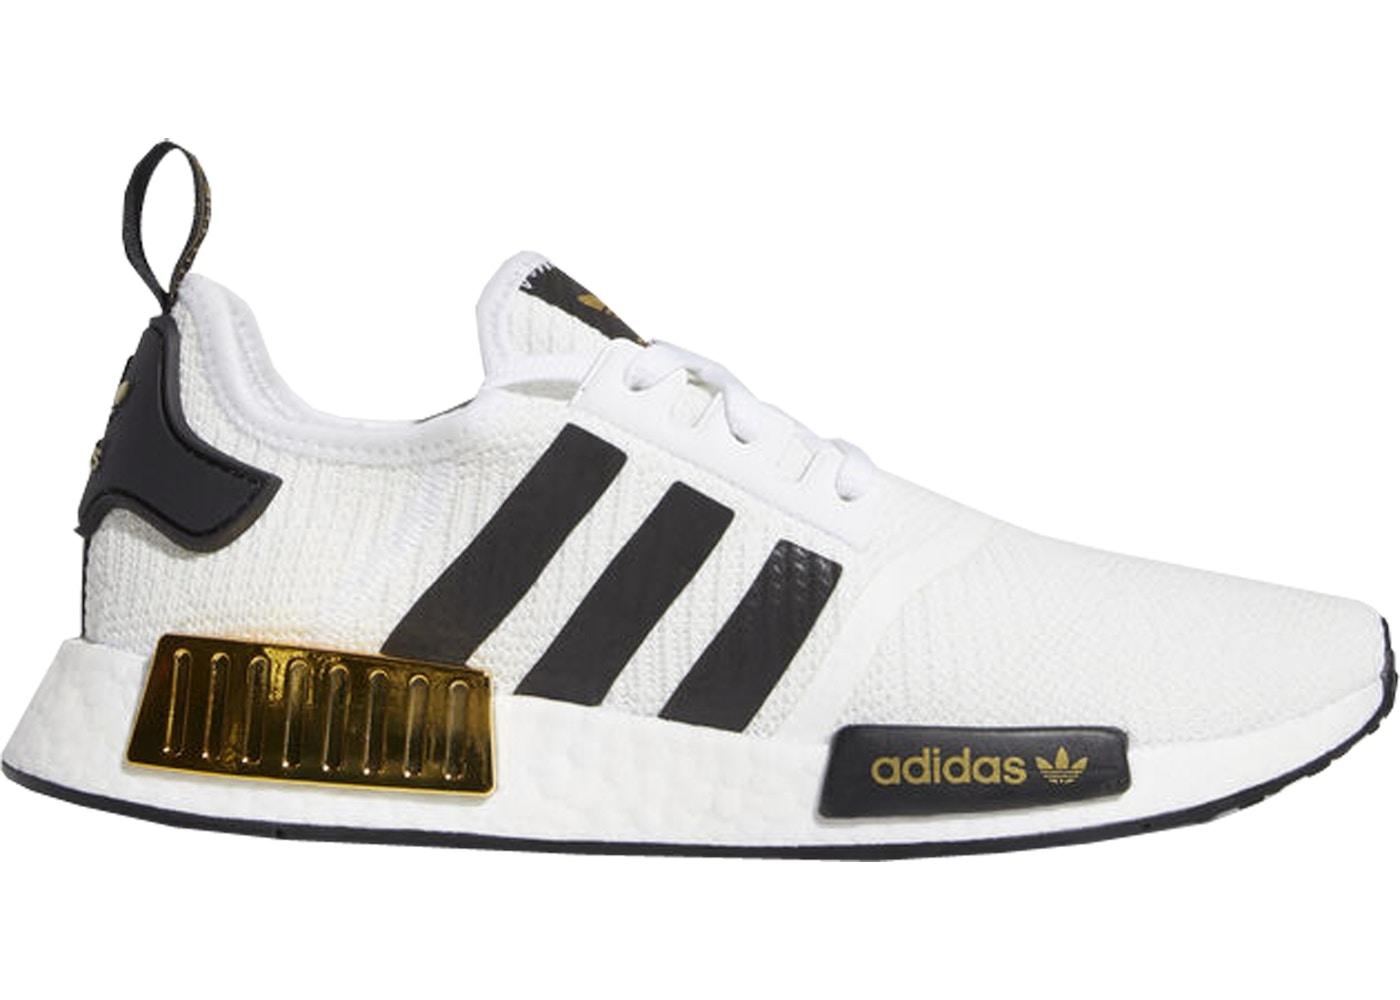 Adidas Nmd R1 White Black Gold Eg5662